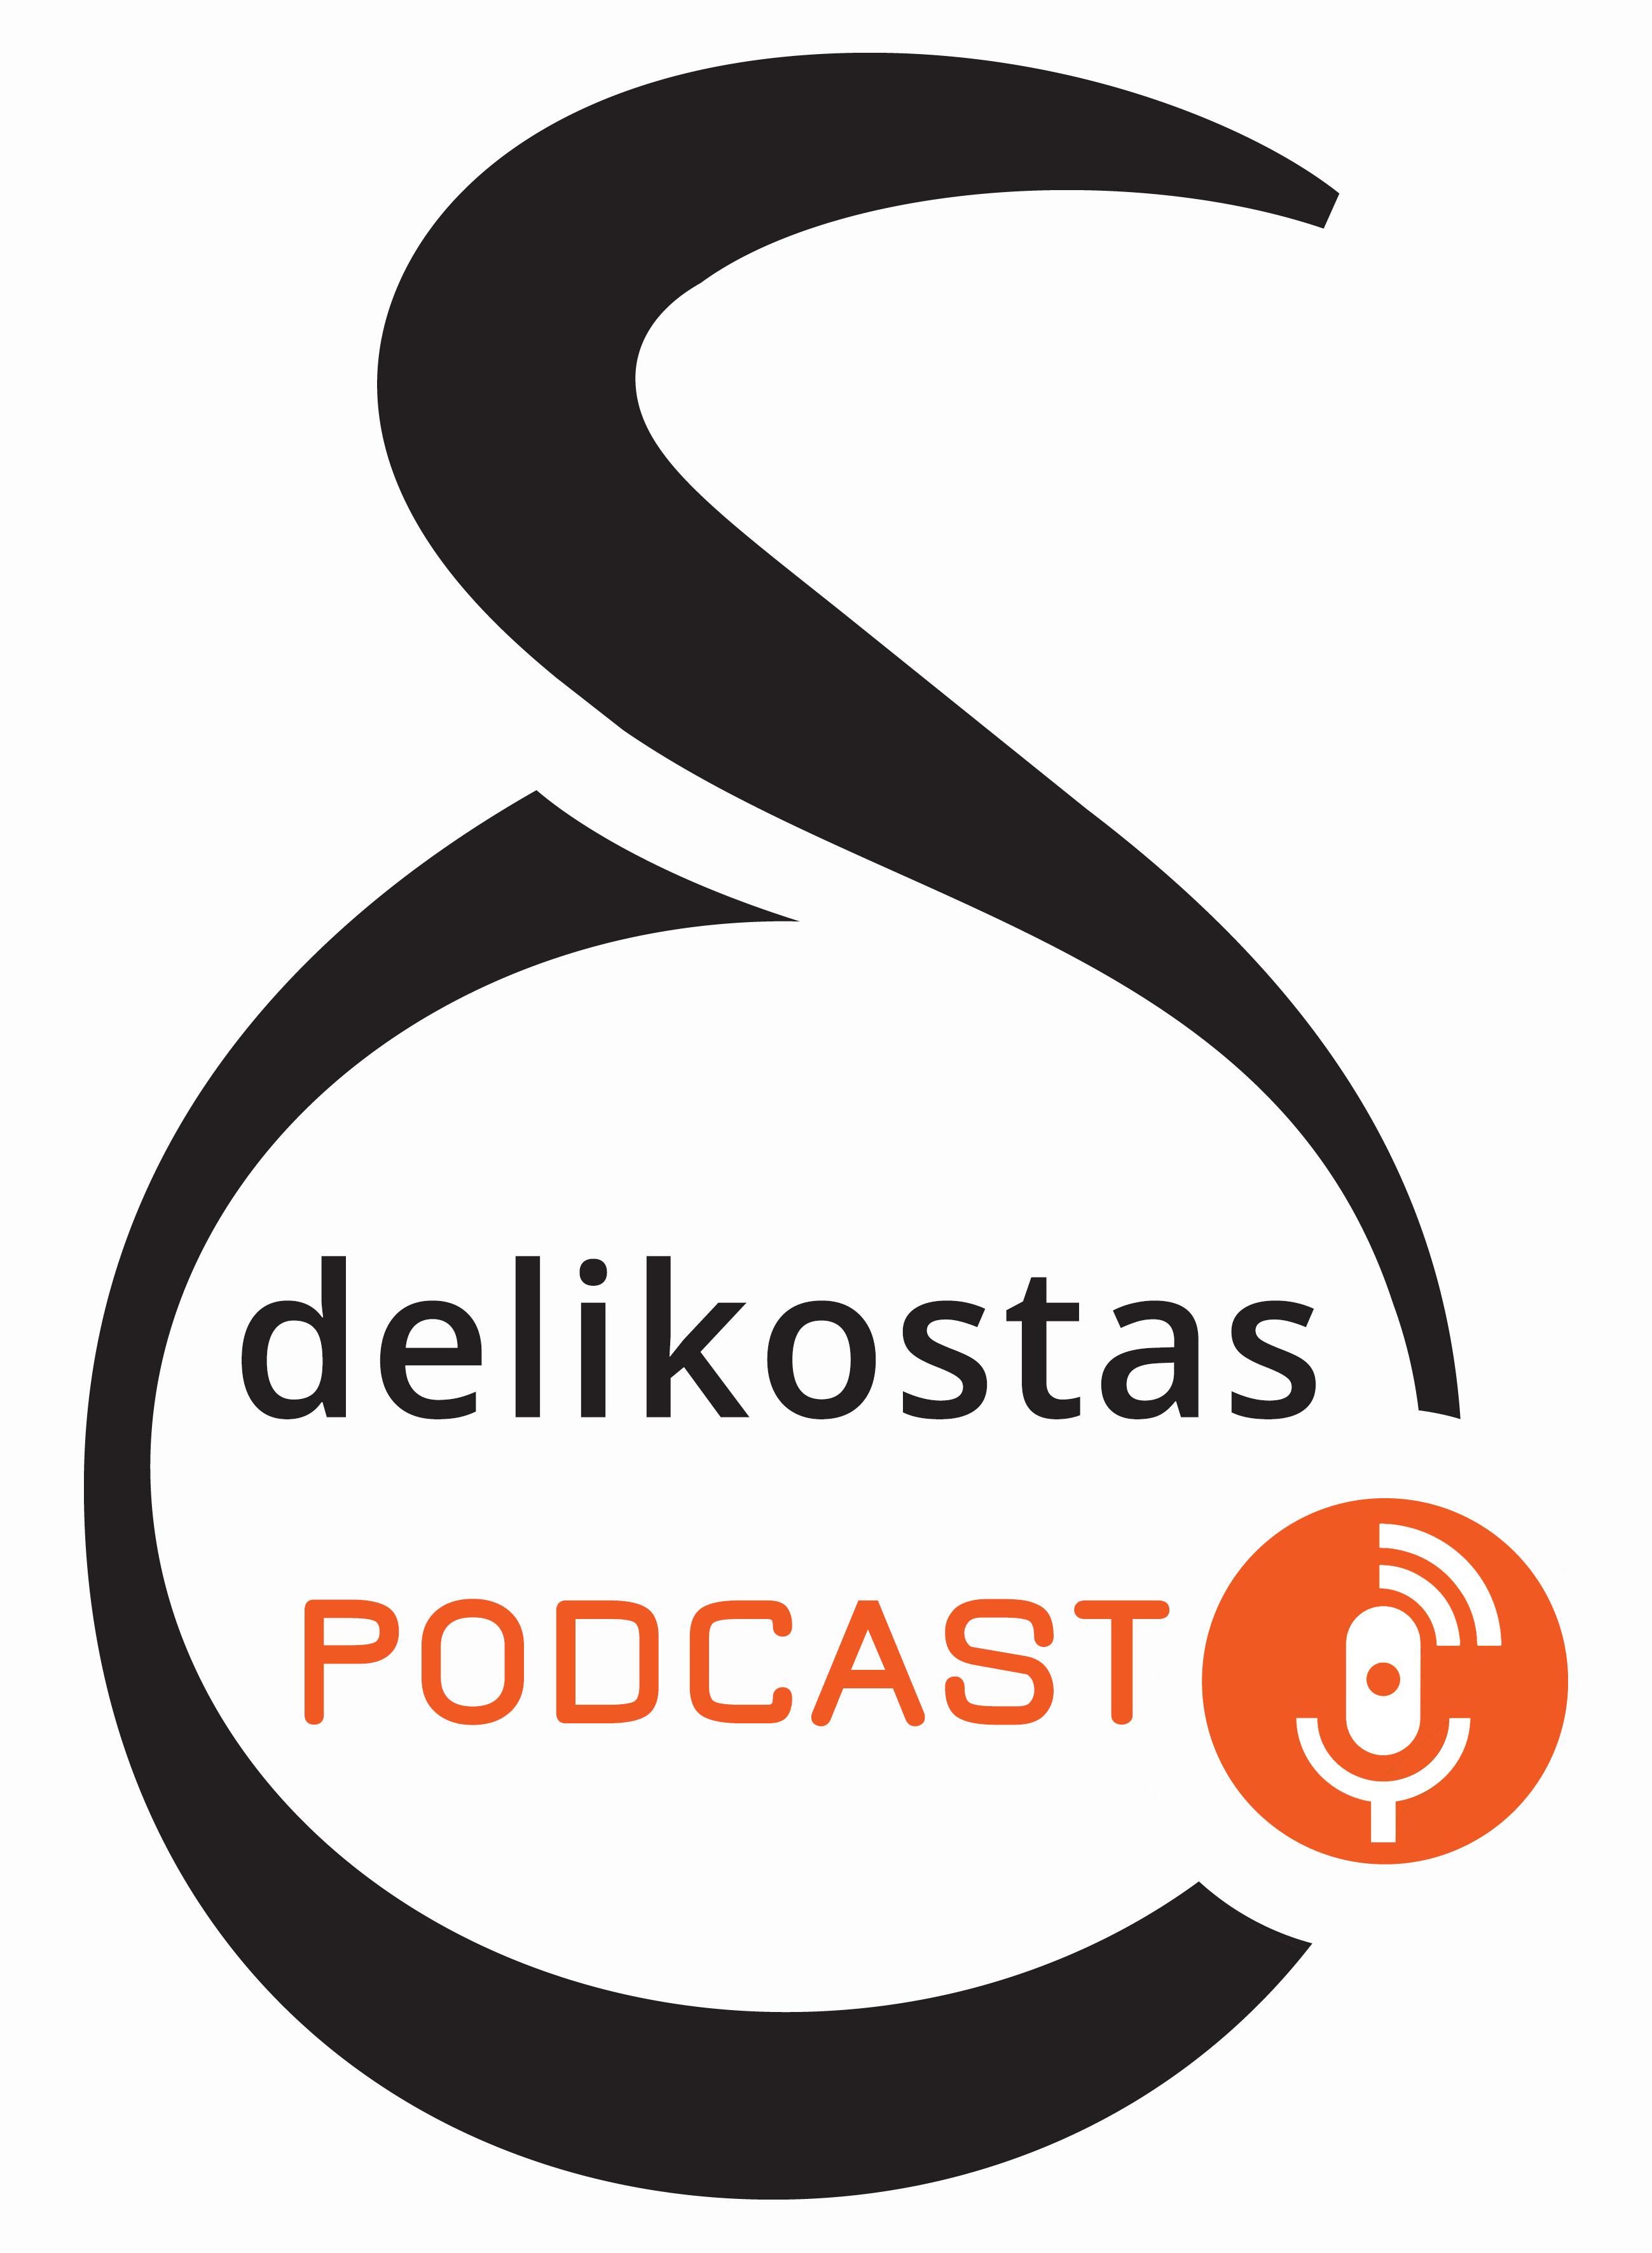 delikostas podcast